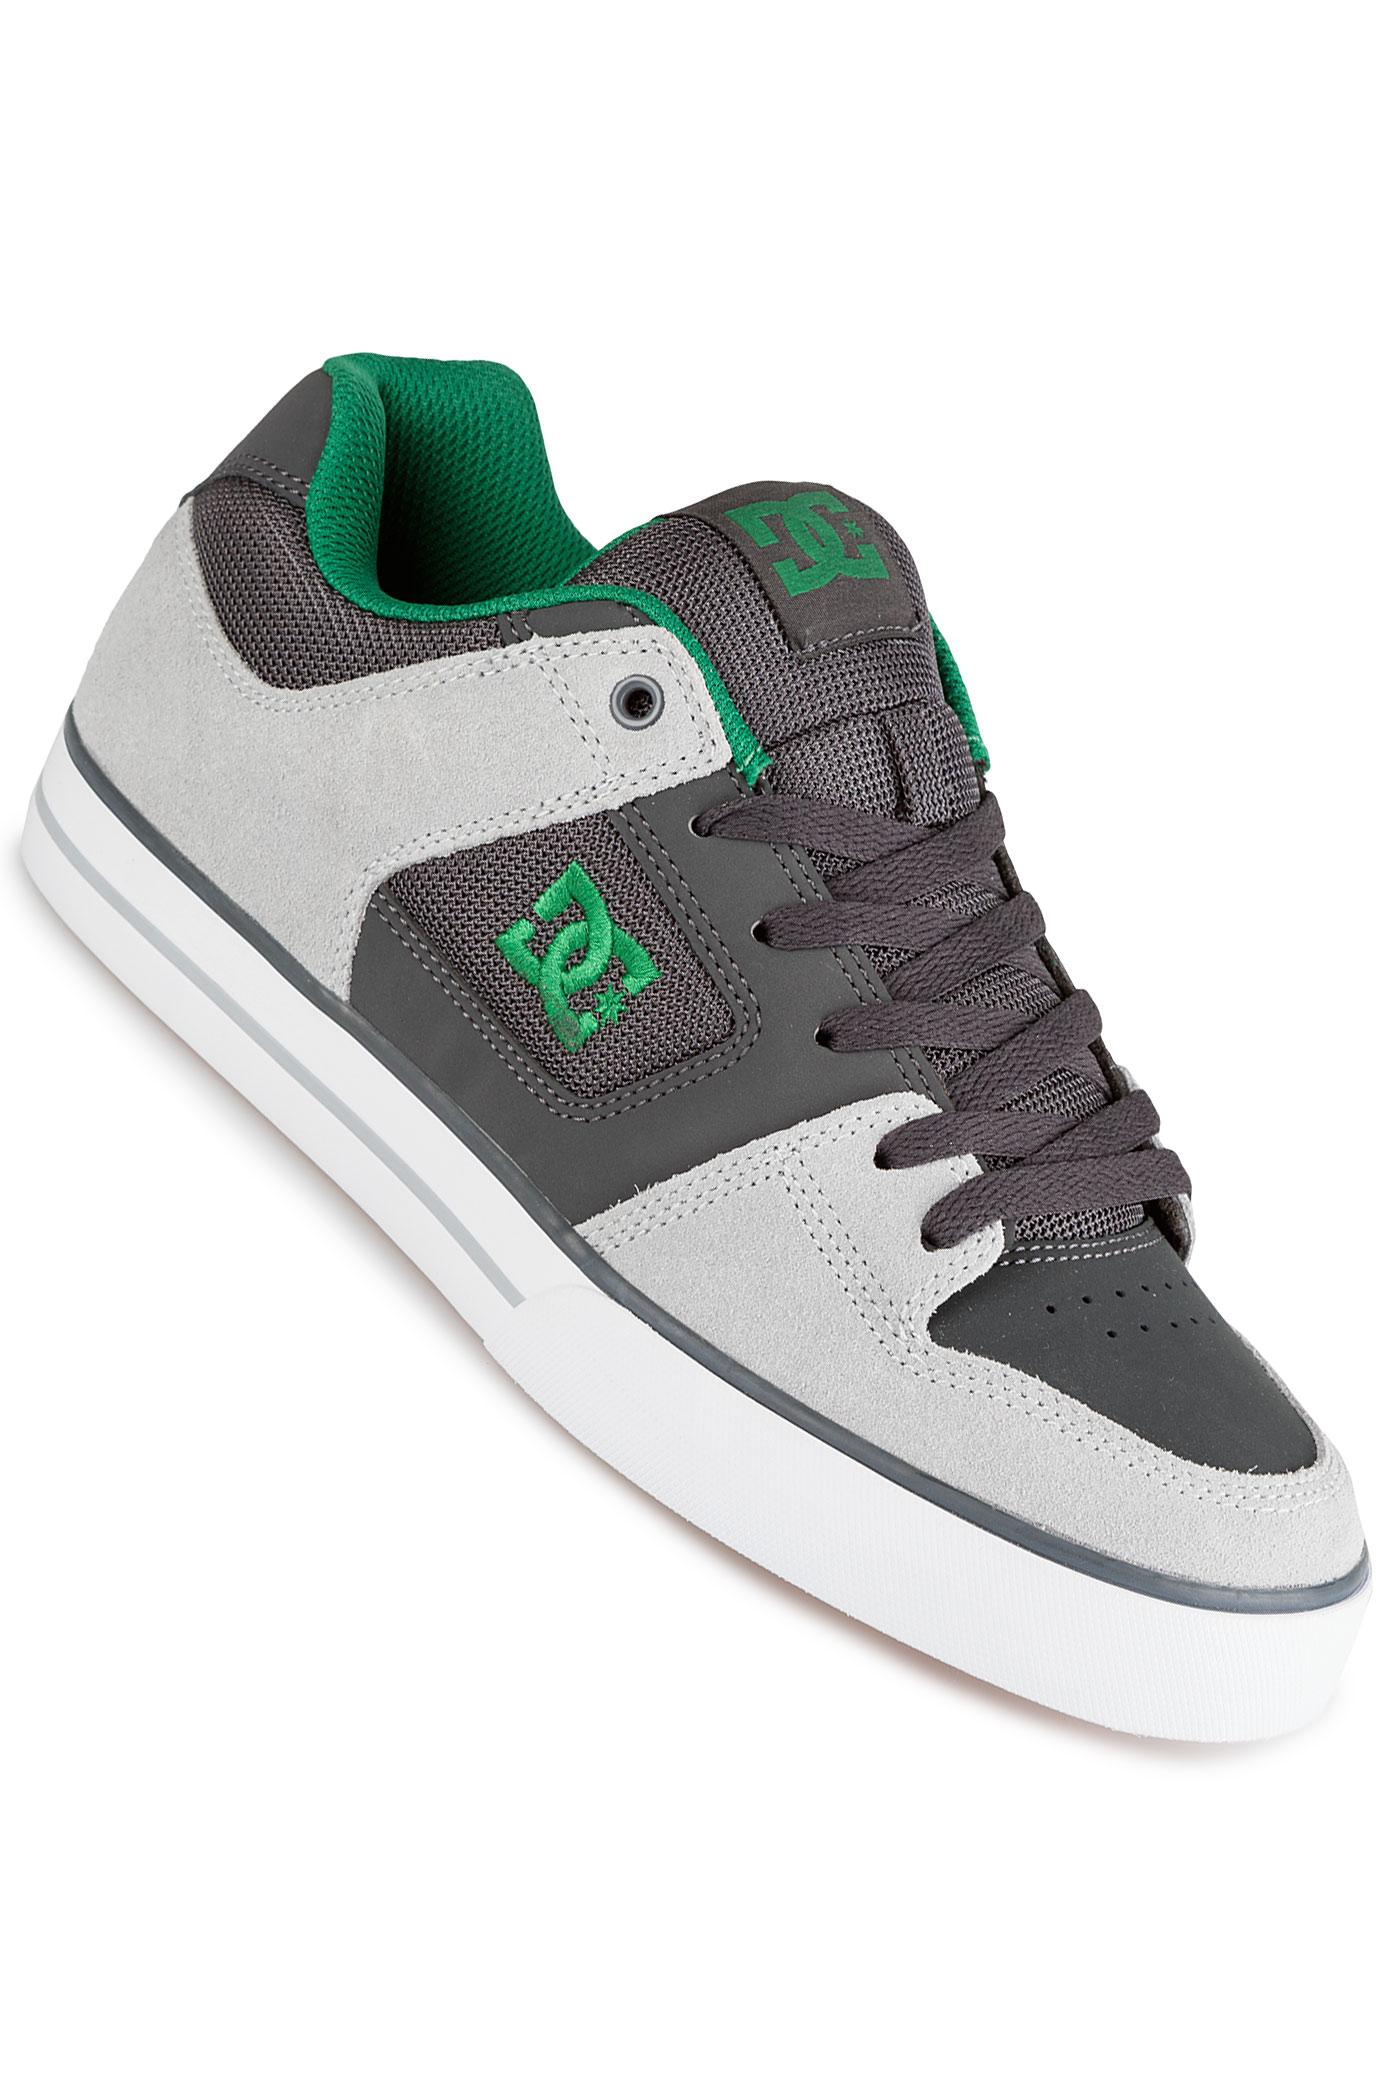 Green Pure Dc Pure Se Chaussuregrey Dc CroQeWBEdx